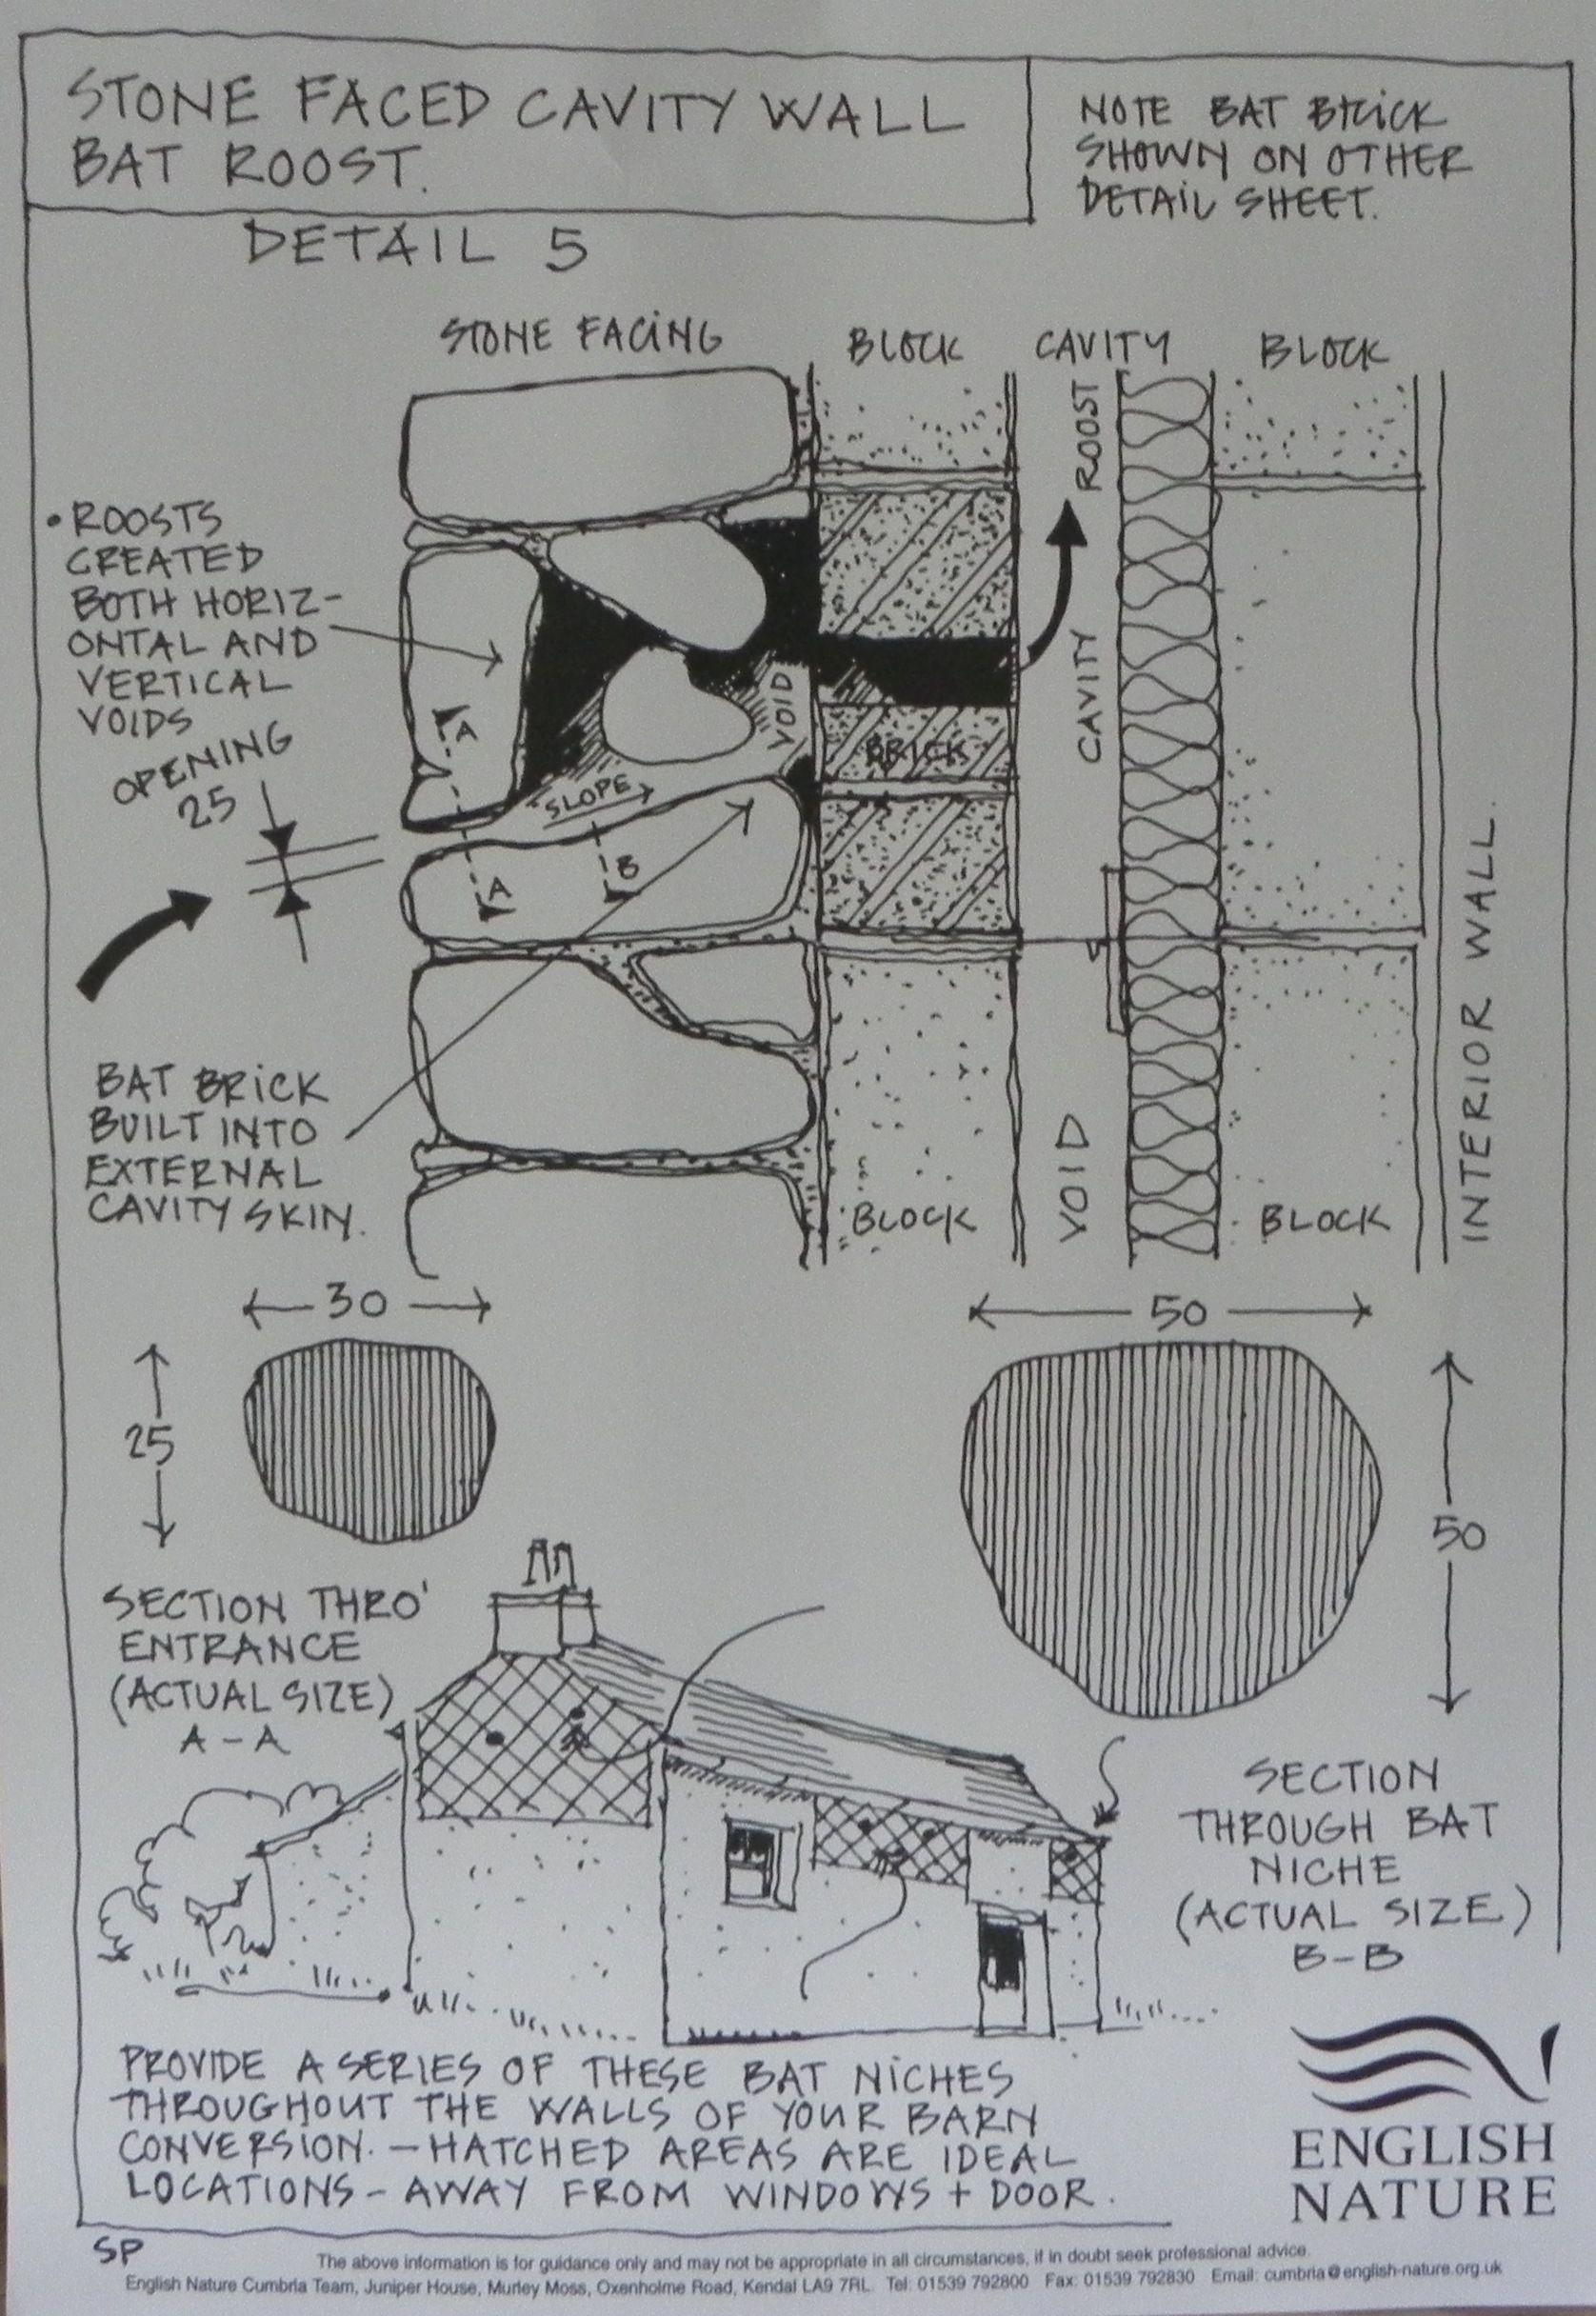 Stone Faced Cavity Wall Information